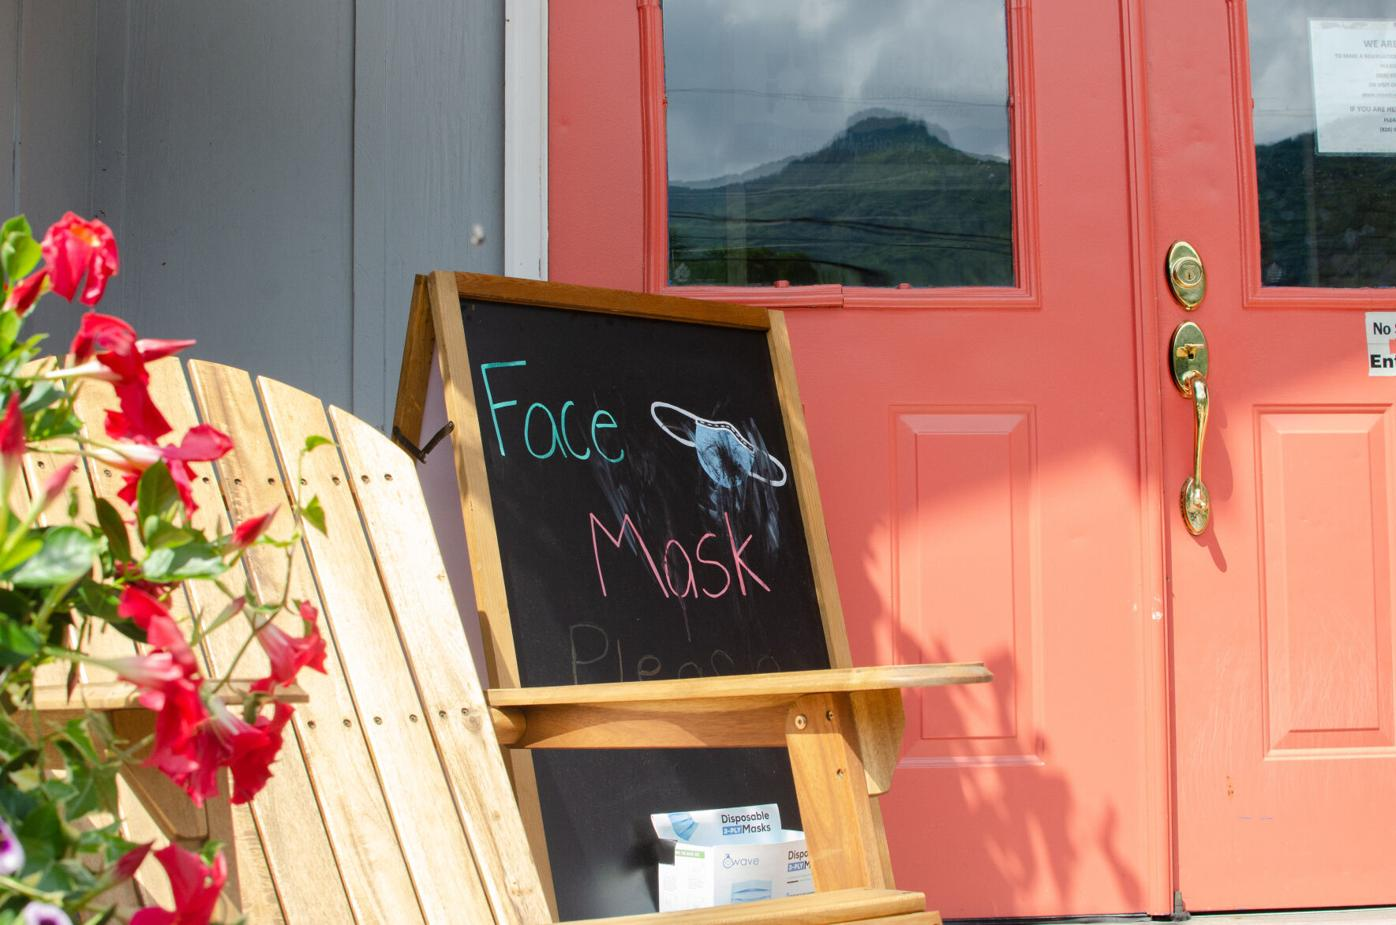 Meadowlark face mask sign.jpg